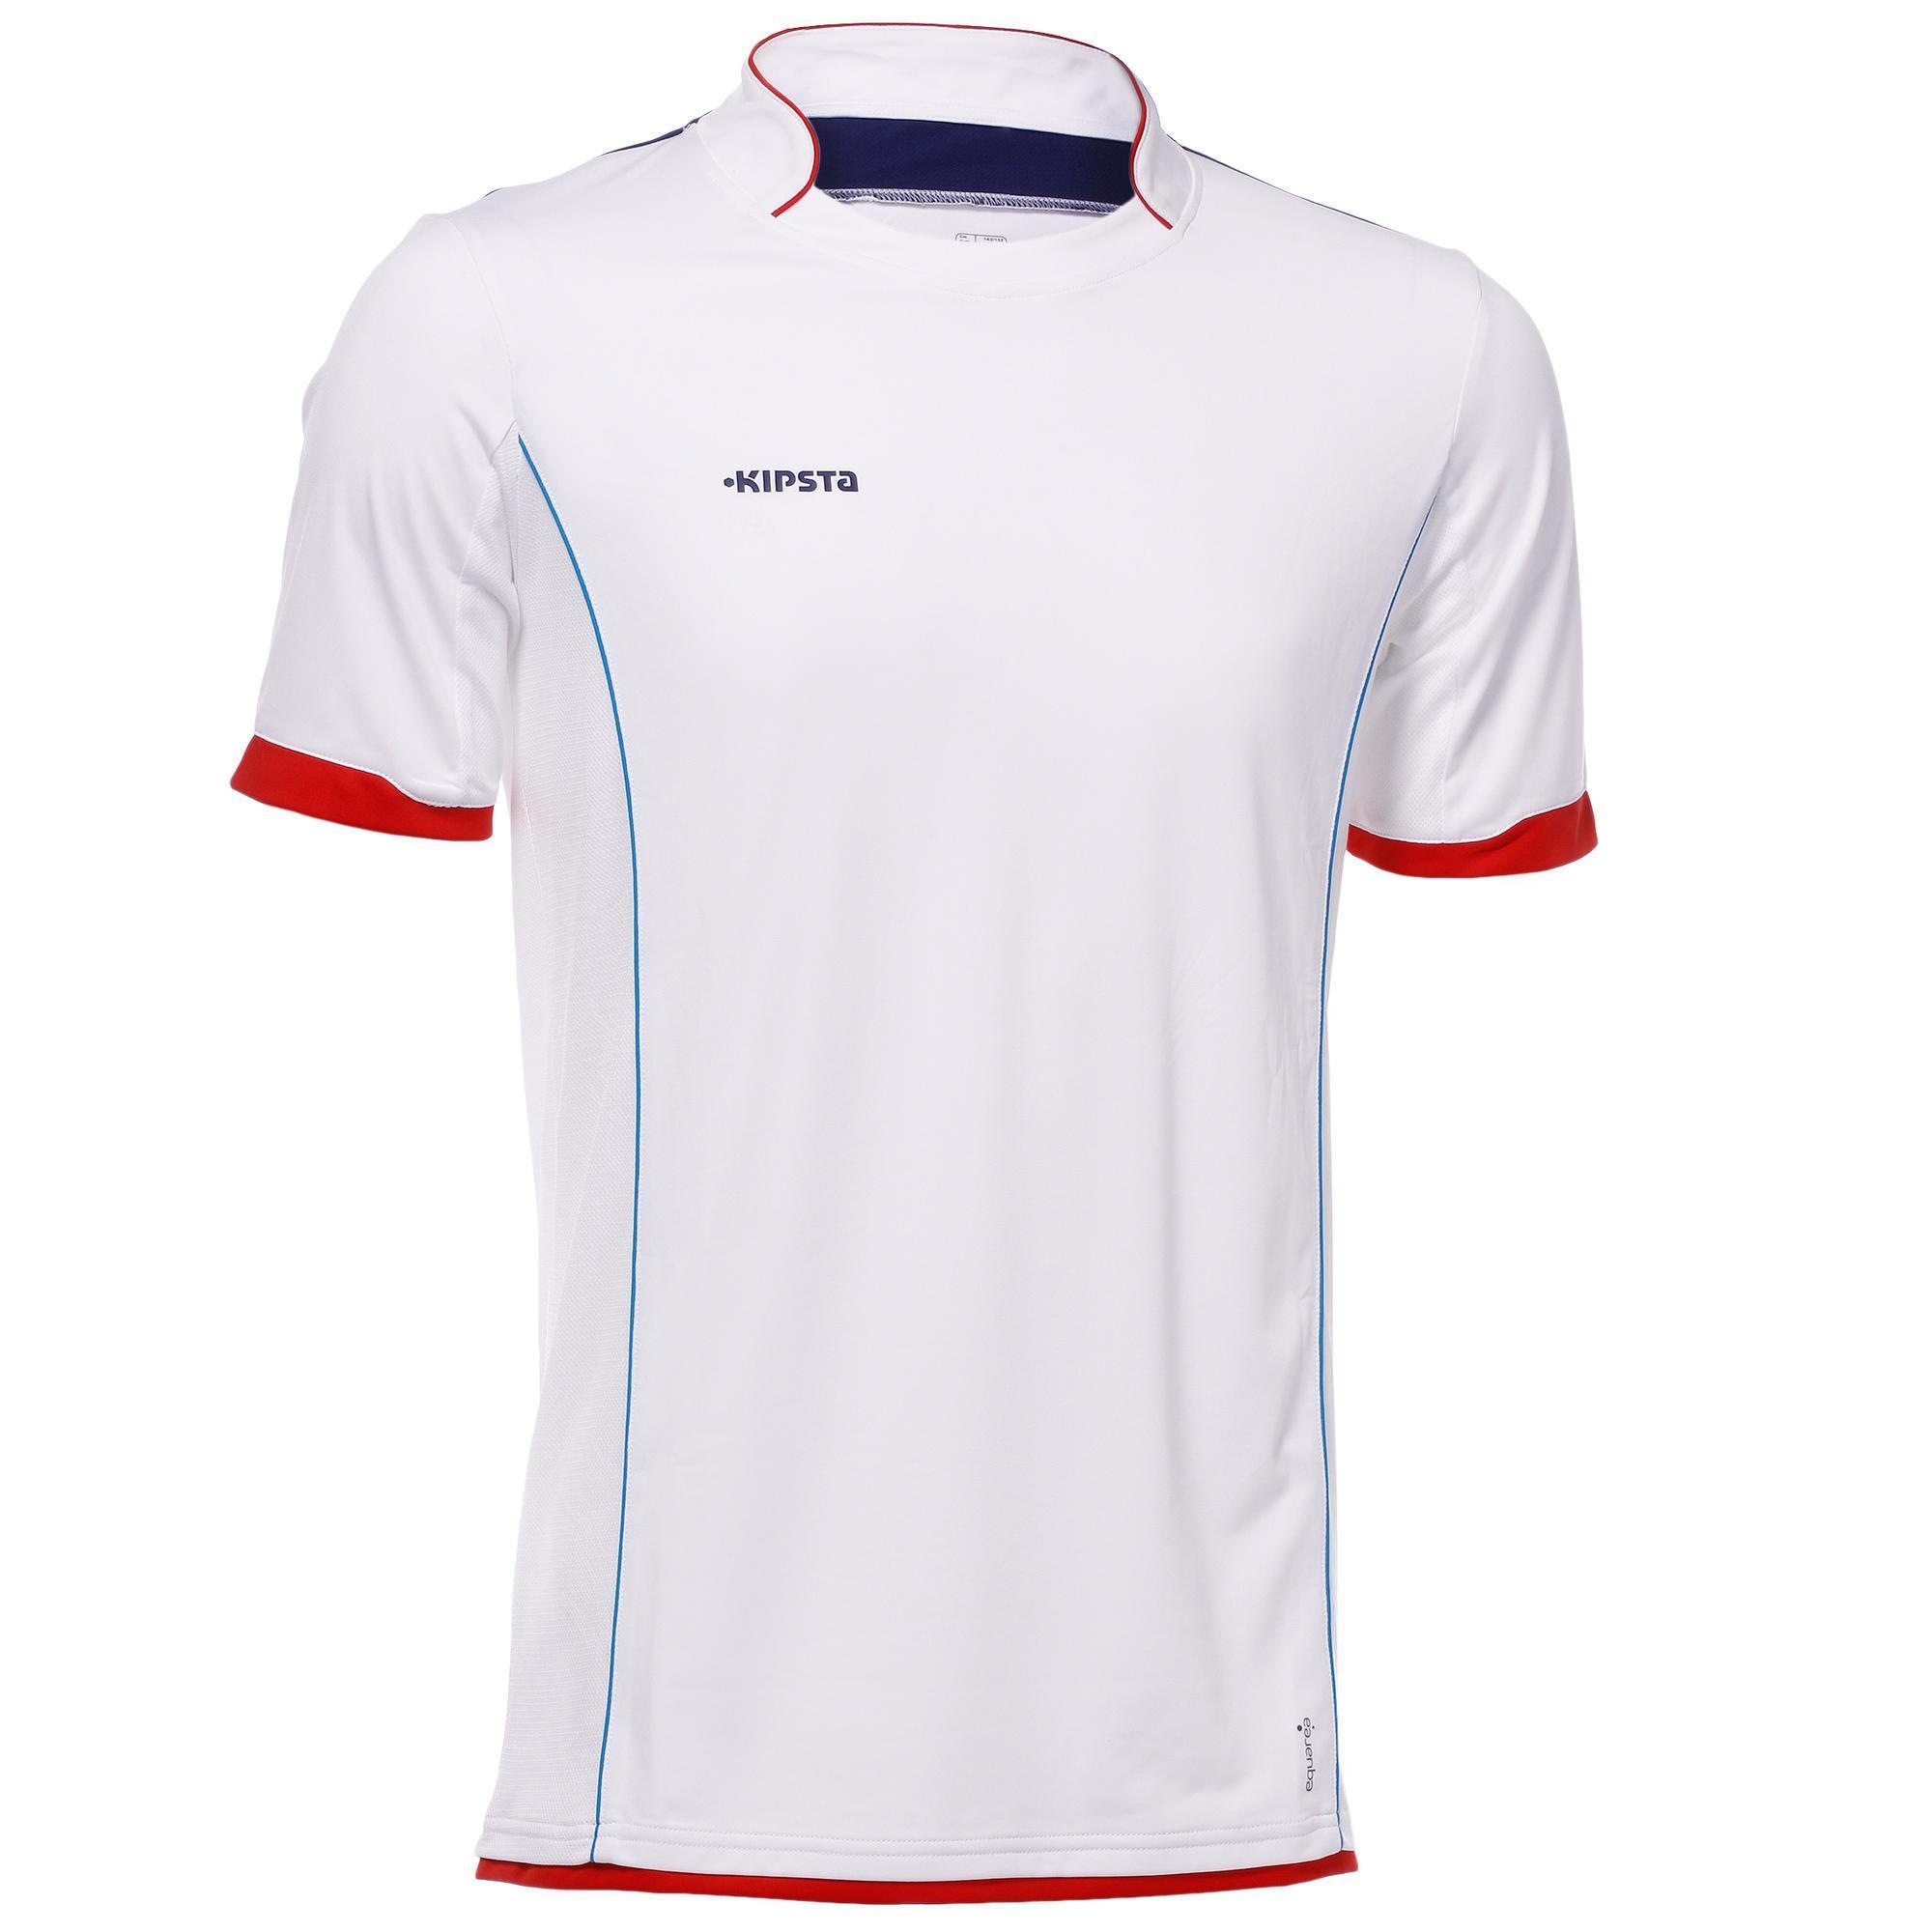 Maillot de football enfant f500 blanc kipsta by decathlon - Cadre maillot de foot ...